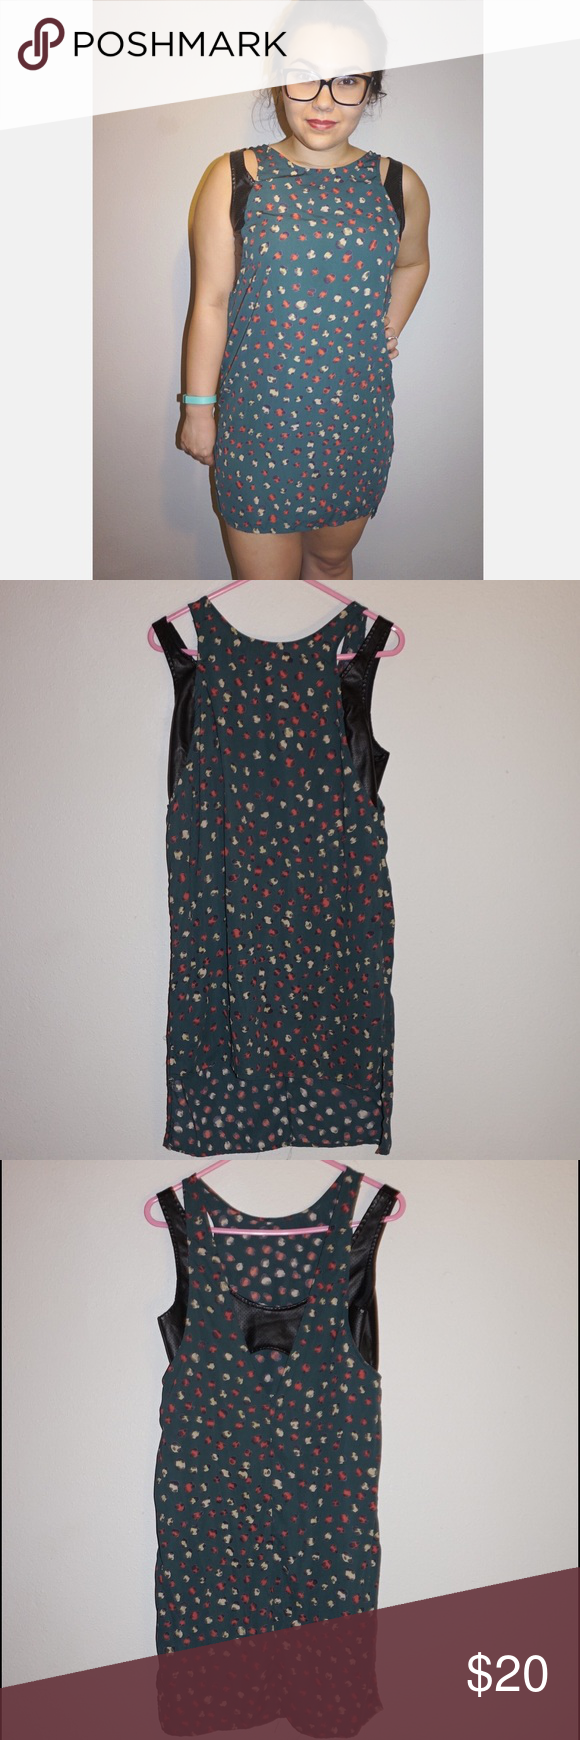 Paper Crane Dress Green chiffon hi-low dress with side slits and vegan leather mock bralette straps Paper Crane Dresses High Low